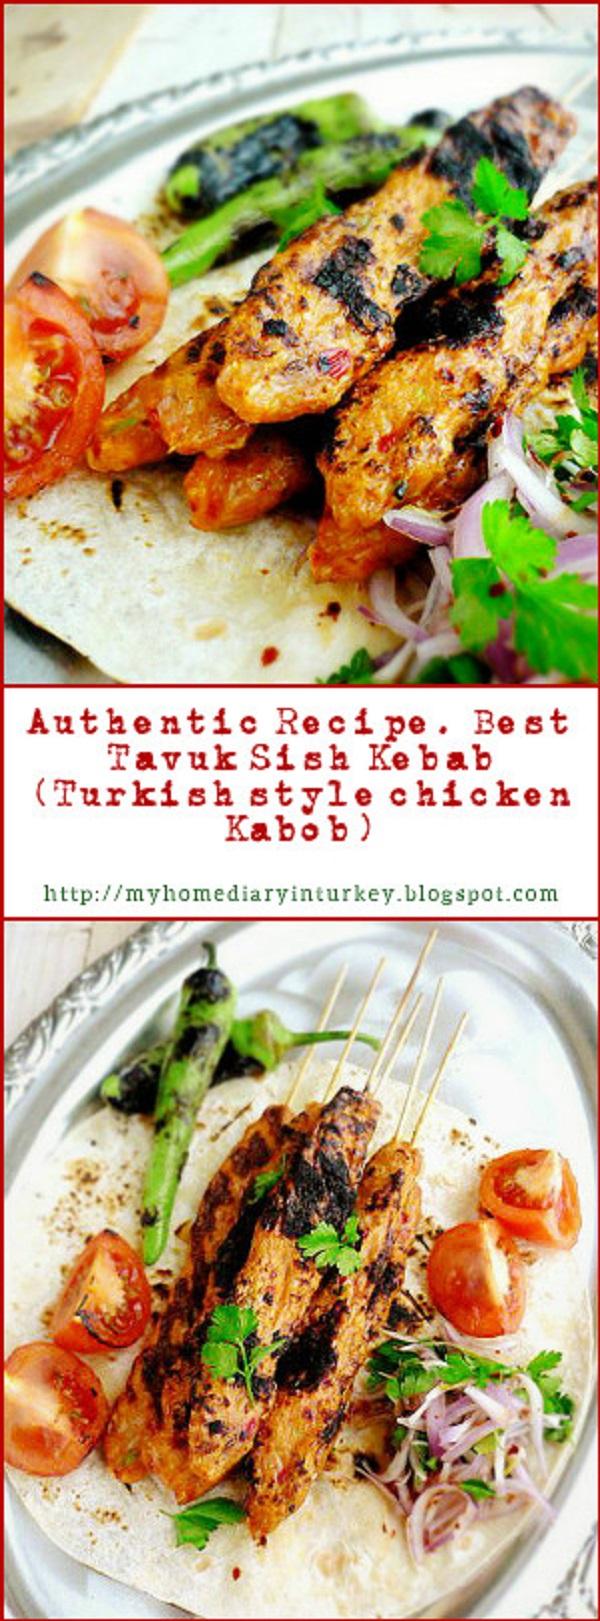 Tavuk Kebabı /  Best Chicken sish Kebab recipe. This delicious chicken kebab was inspired by famed Adana kebab. But I made it from chicken instead of lamb/ beef. But be sure this would be your new favorite list.#Turkishkebab #Turkishfood #kebab #kabob #chickenkebab #lamb #beefkebab #adanakebab #maindish #sishkebab #barbecue #grilled #InheritanceRecipes #resepmasakanturki #foodphotography